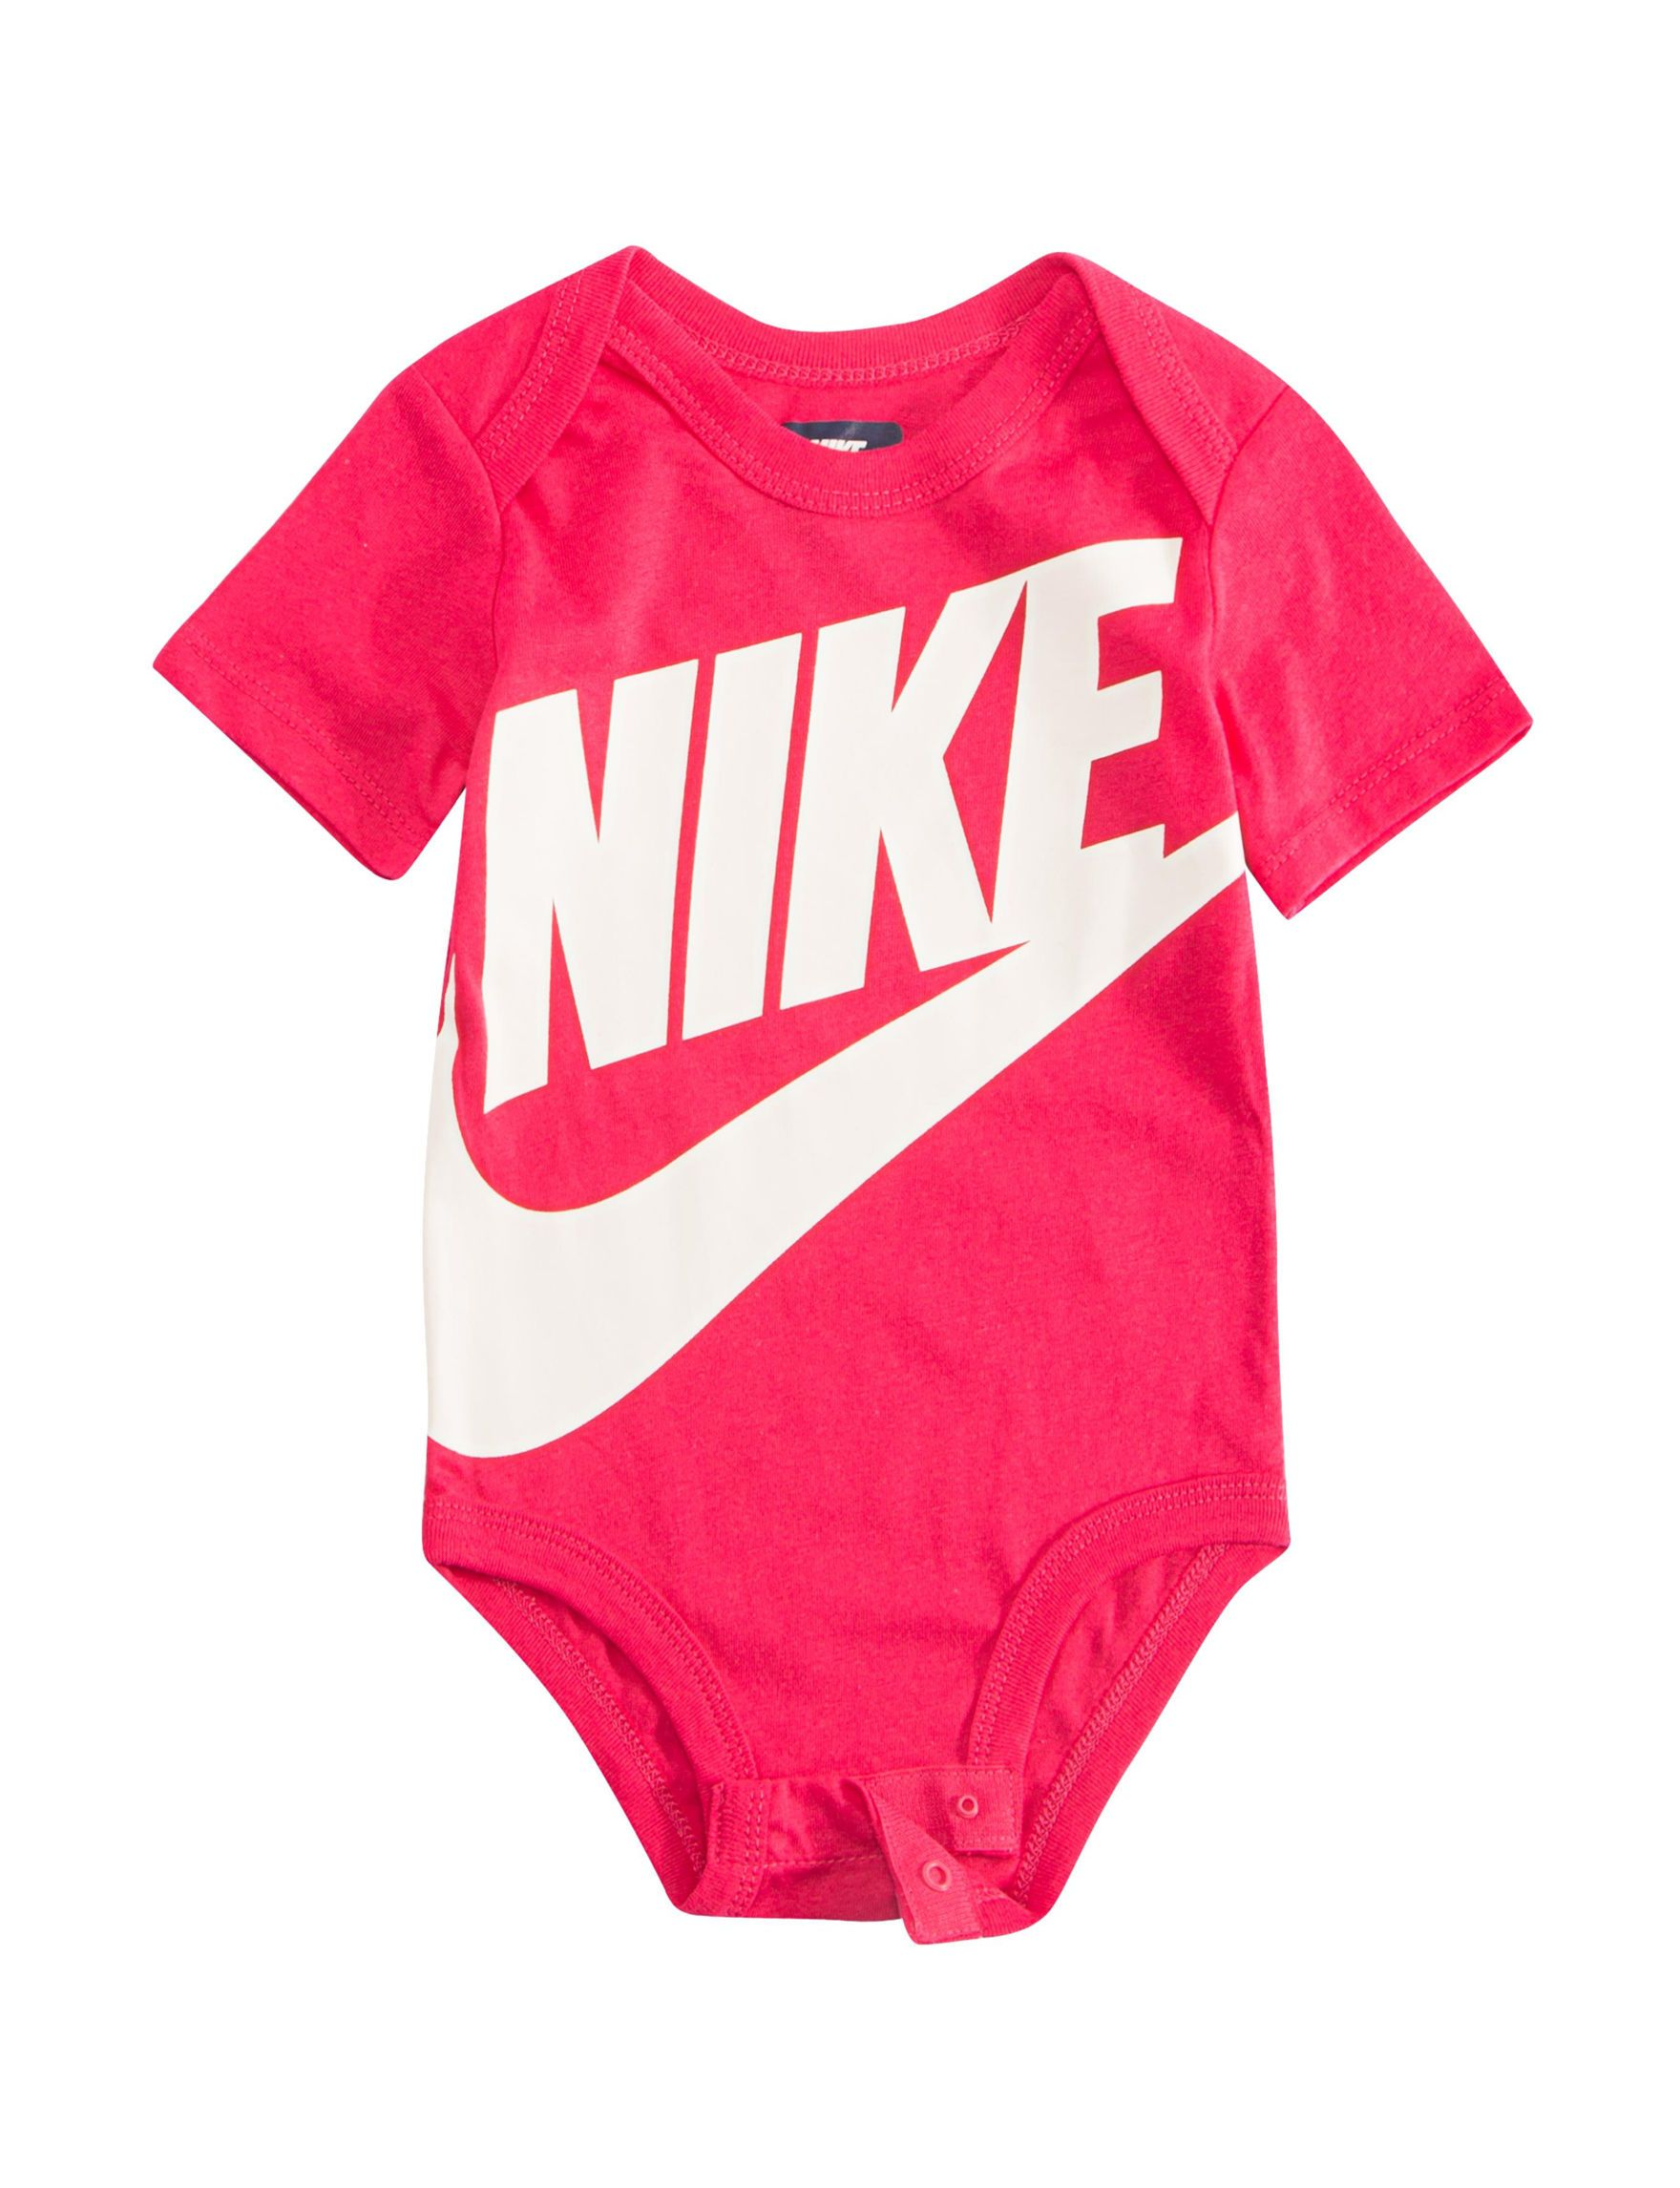 Nike baby girl clothes, Baby girl nike